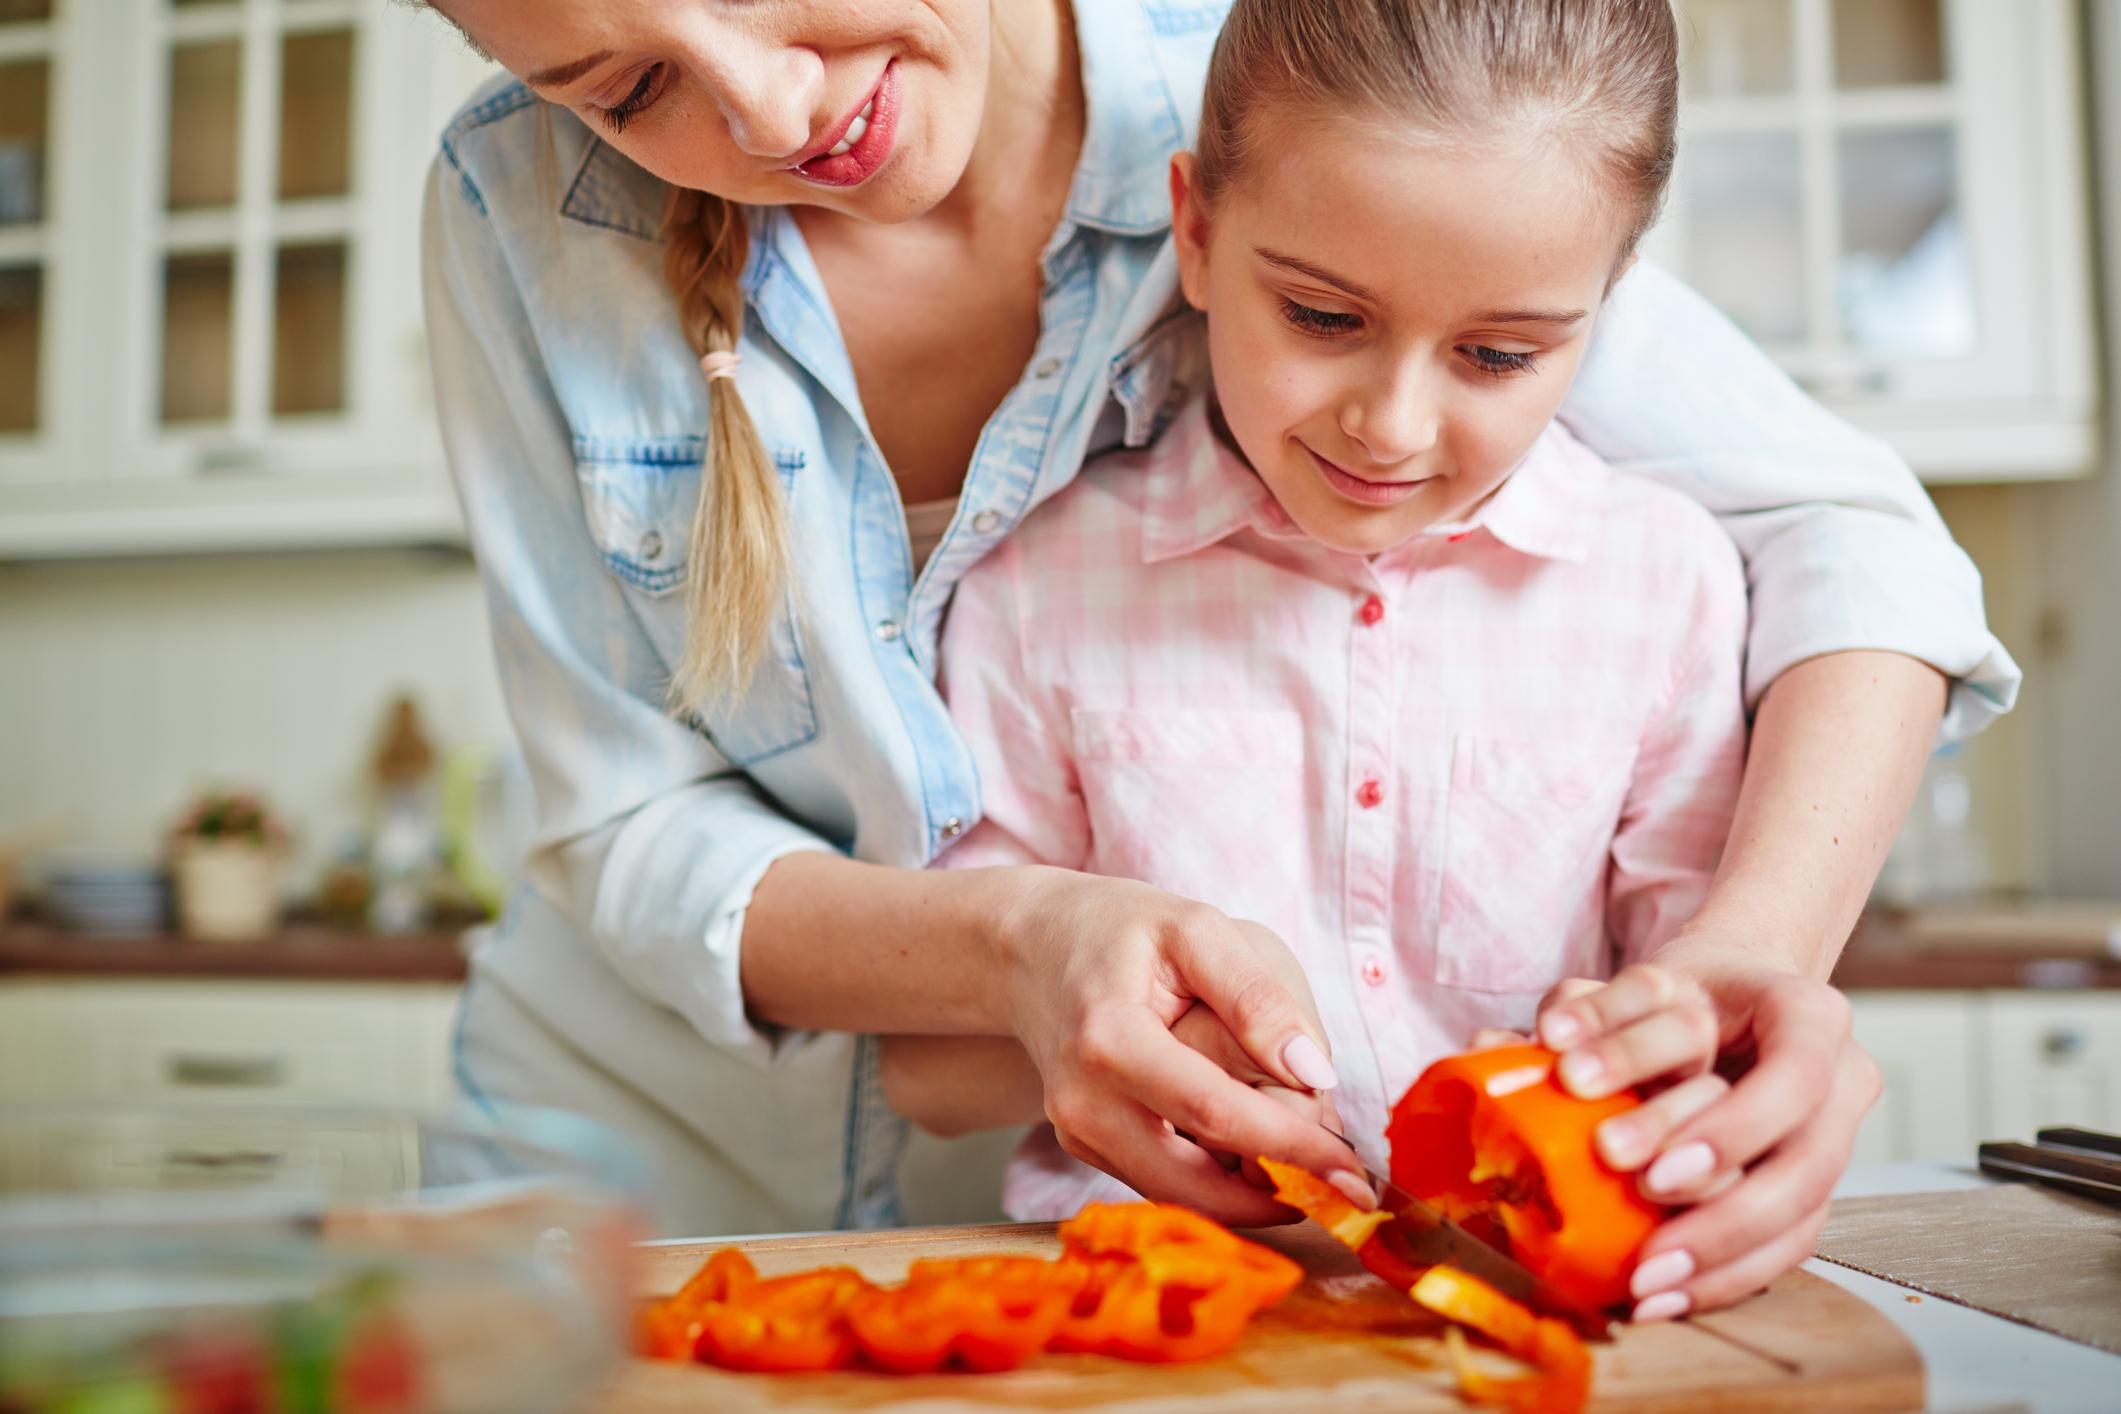 Woman helps child slice an orange pepper.